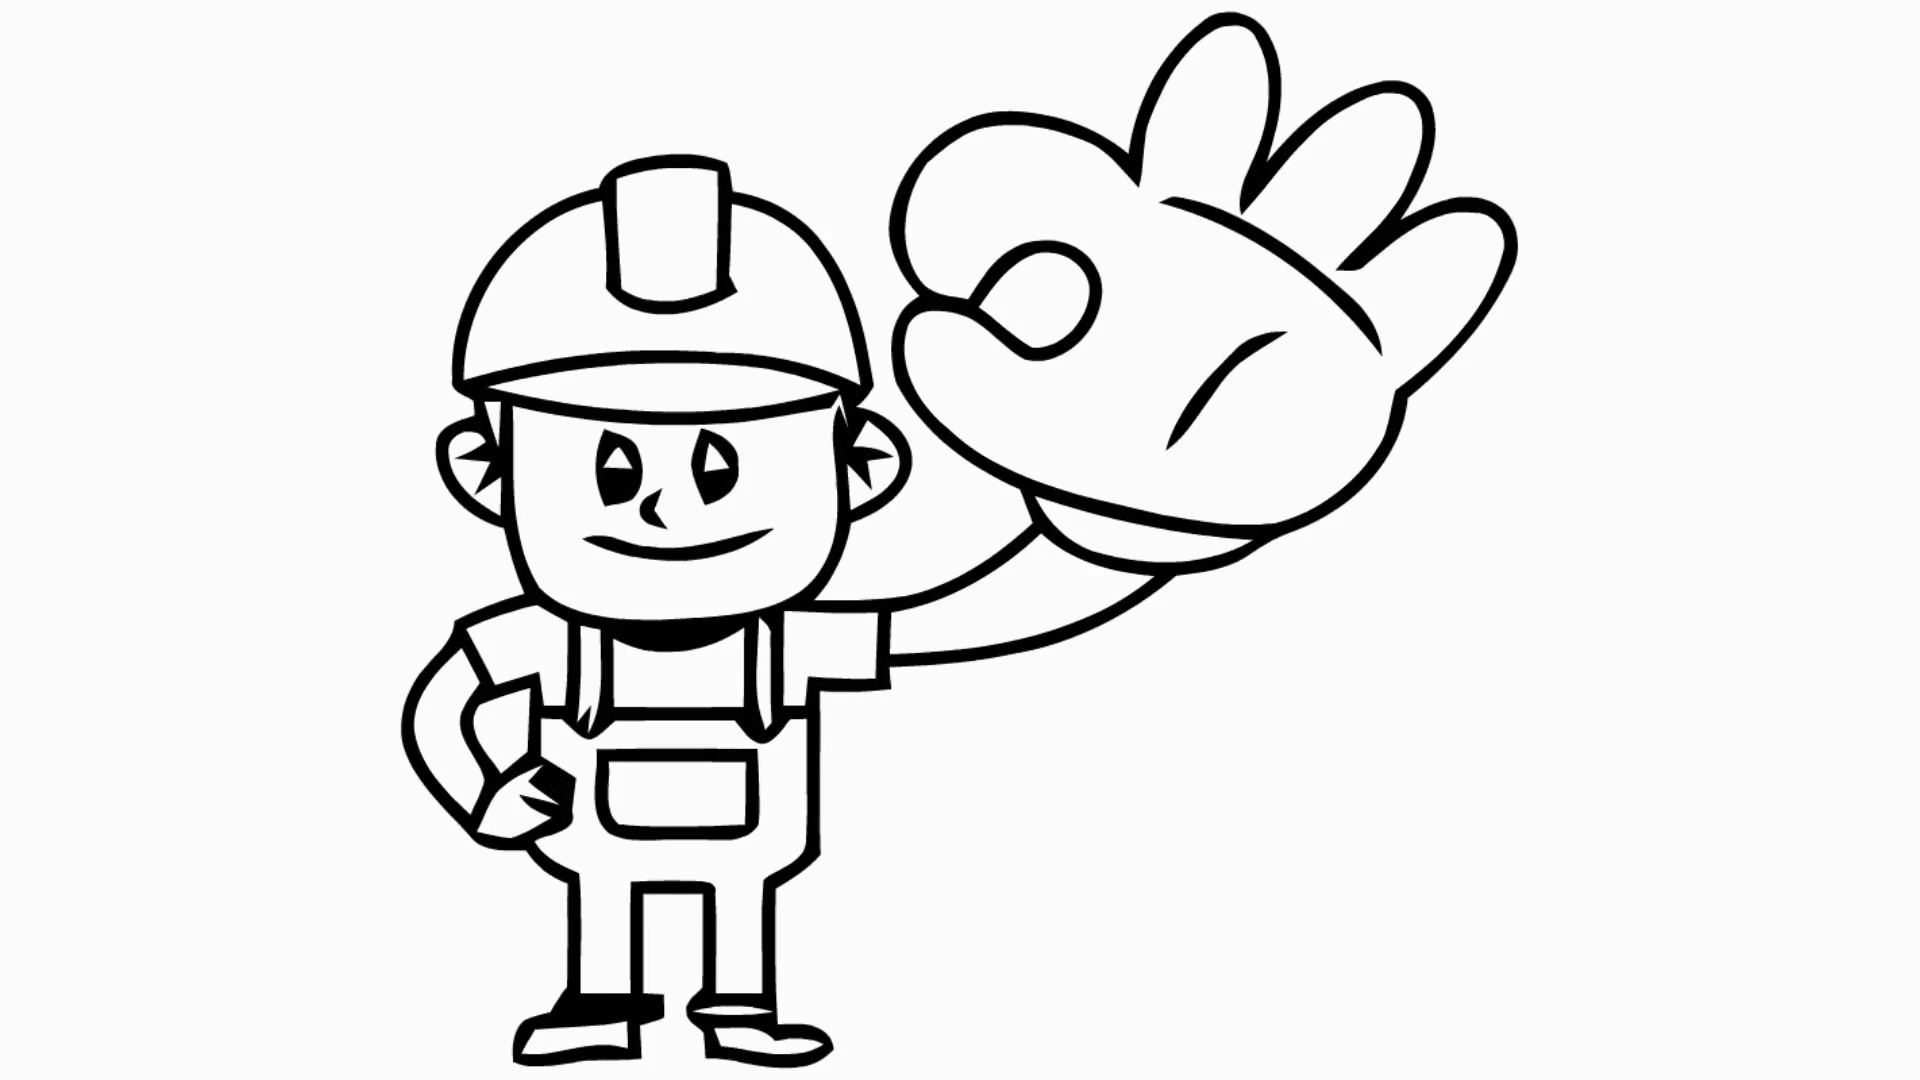 1920x1080 Worker With Big Hand Cartoon Illustration Hand Drawn Animation